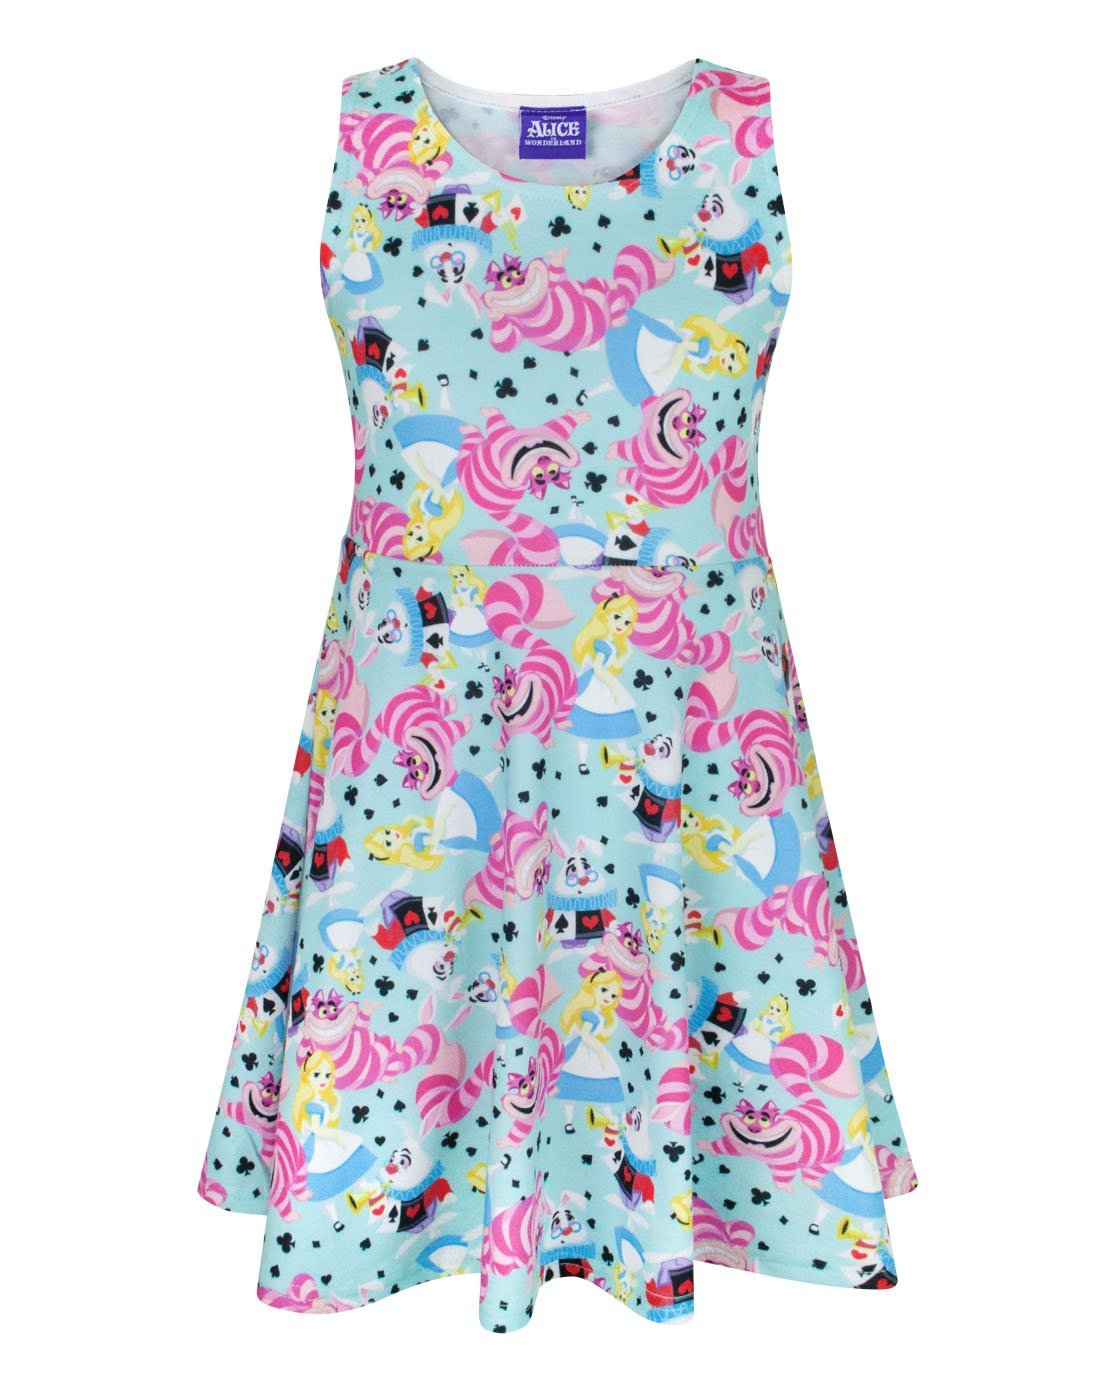 Disney Alice In Wonderland Girls Skater Dress (9-10 Years)